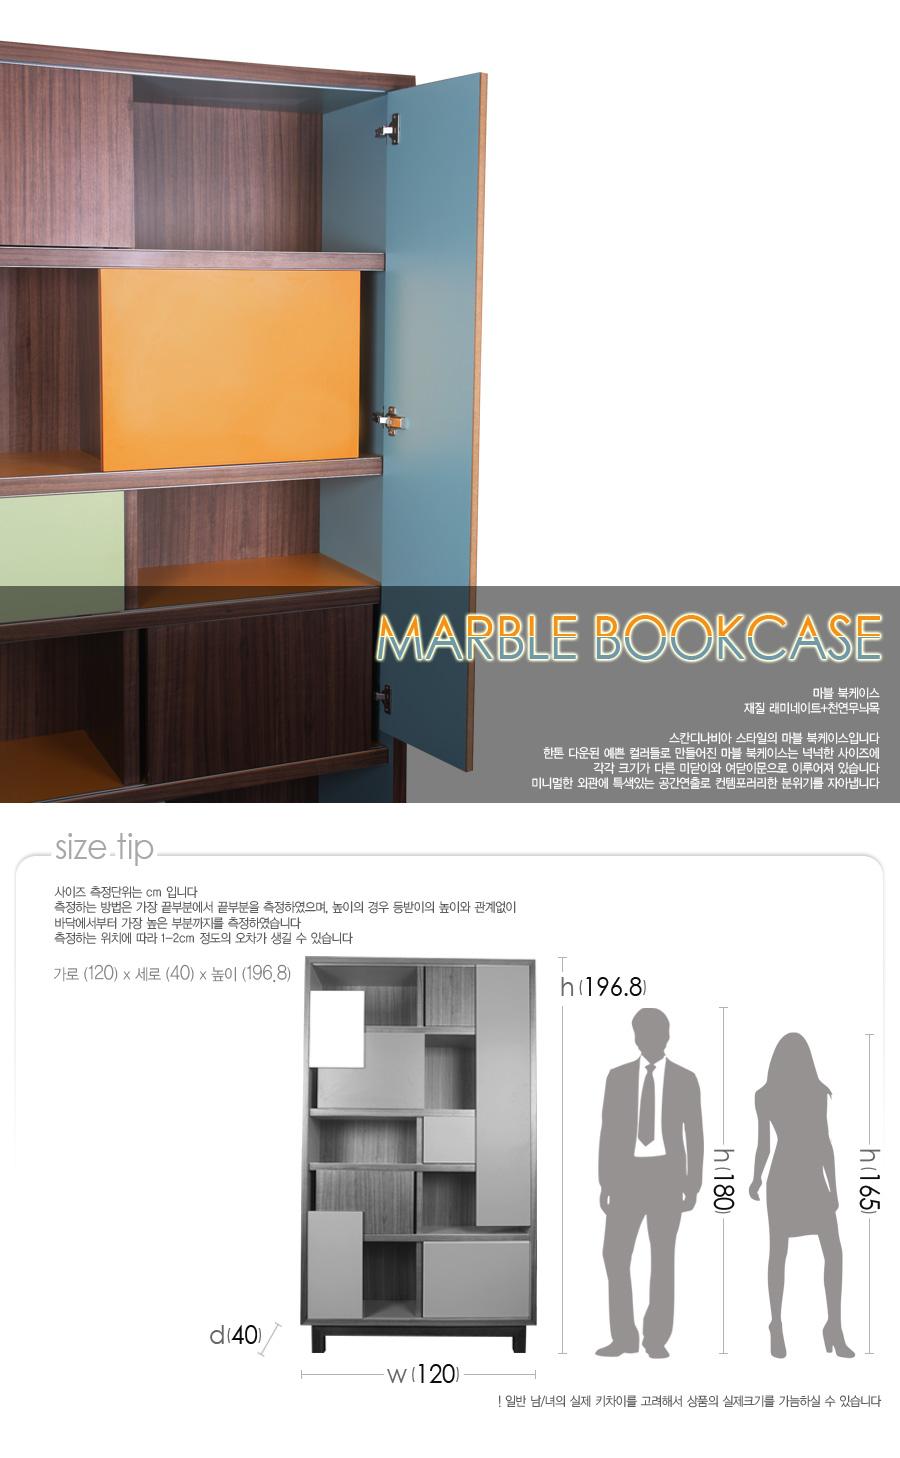 marble-bookcase_01.jpg